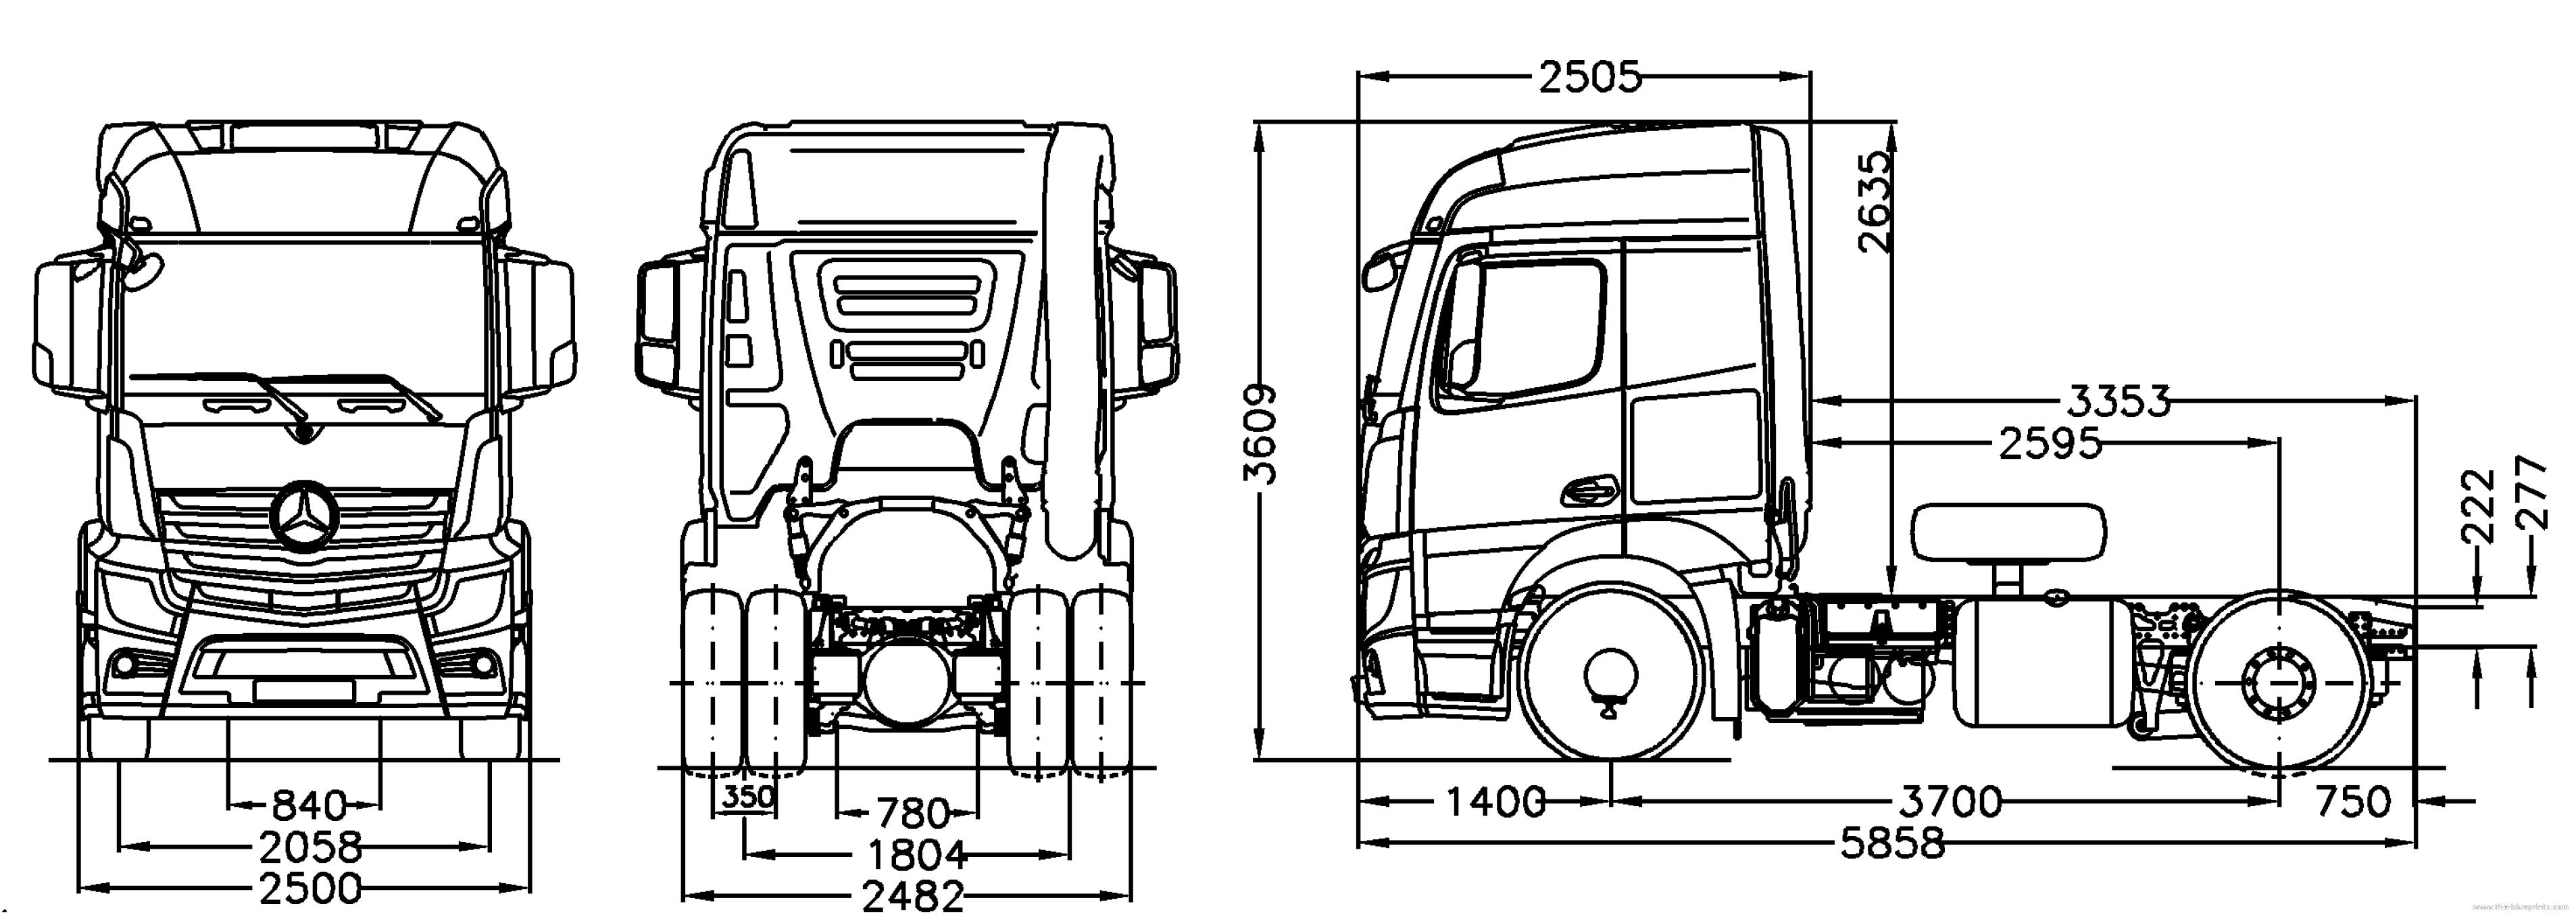 the blueprints trucks mercedes benz mercedes benz actros 4x2 semi trailer. Black Bedroom Furniture Sets. Home Design Ideas